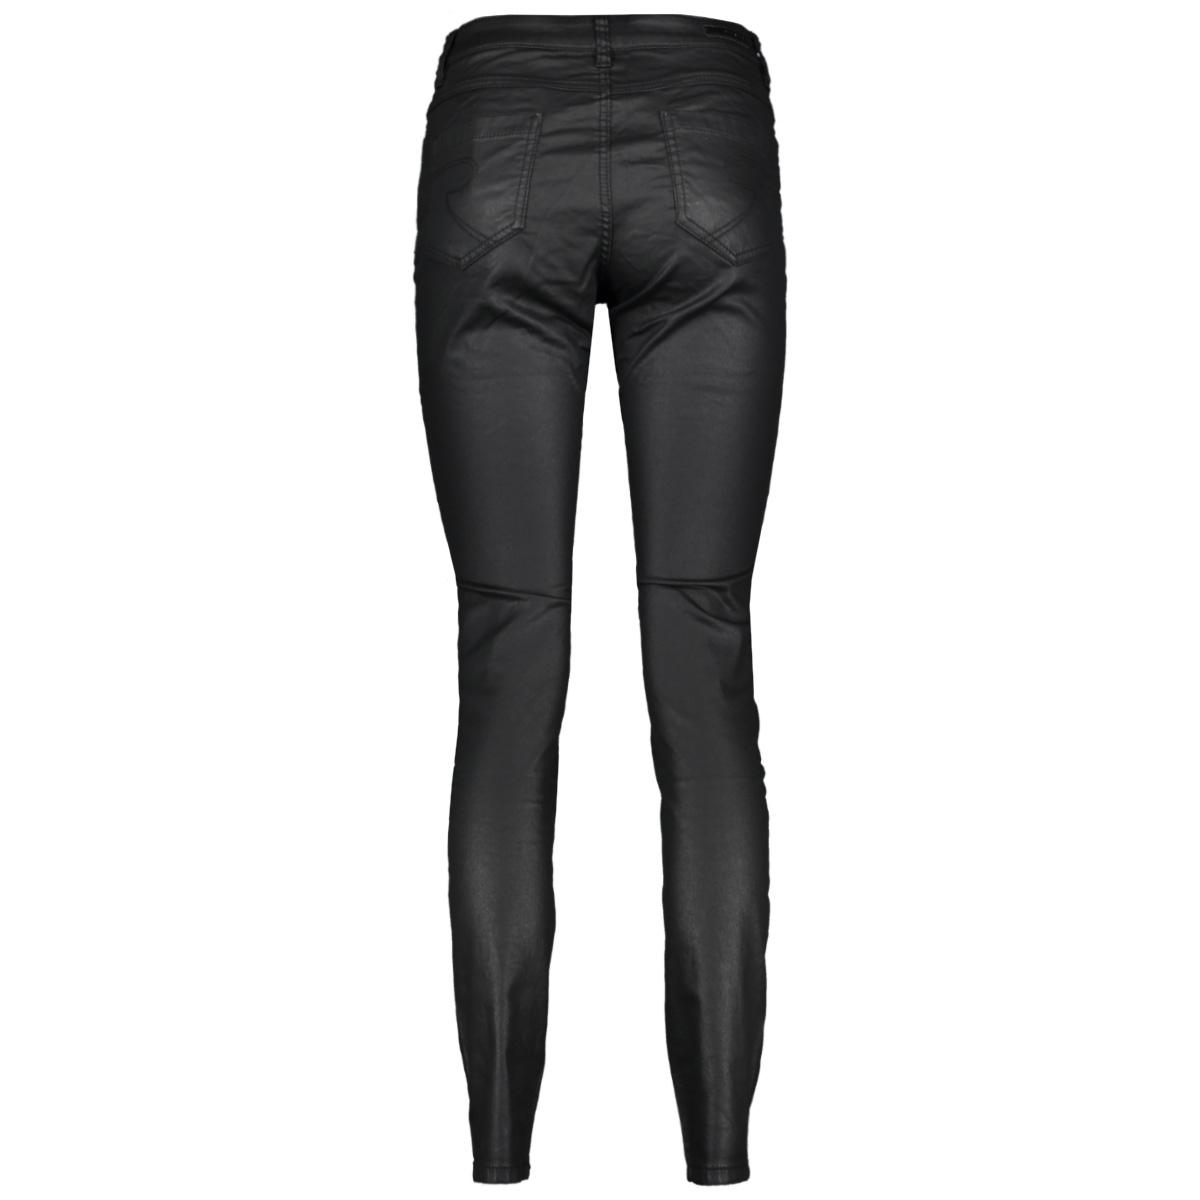 coated jeans 01516 10 geisha jeans black